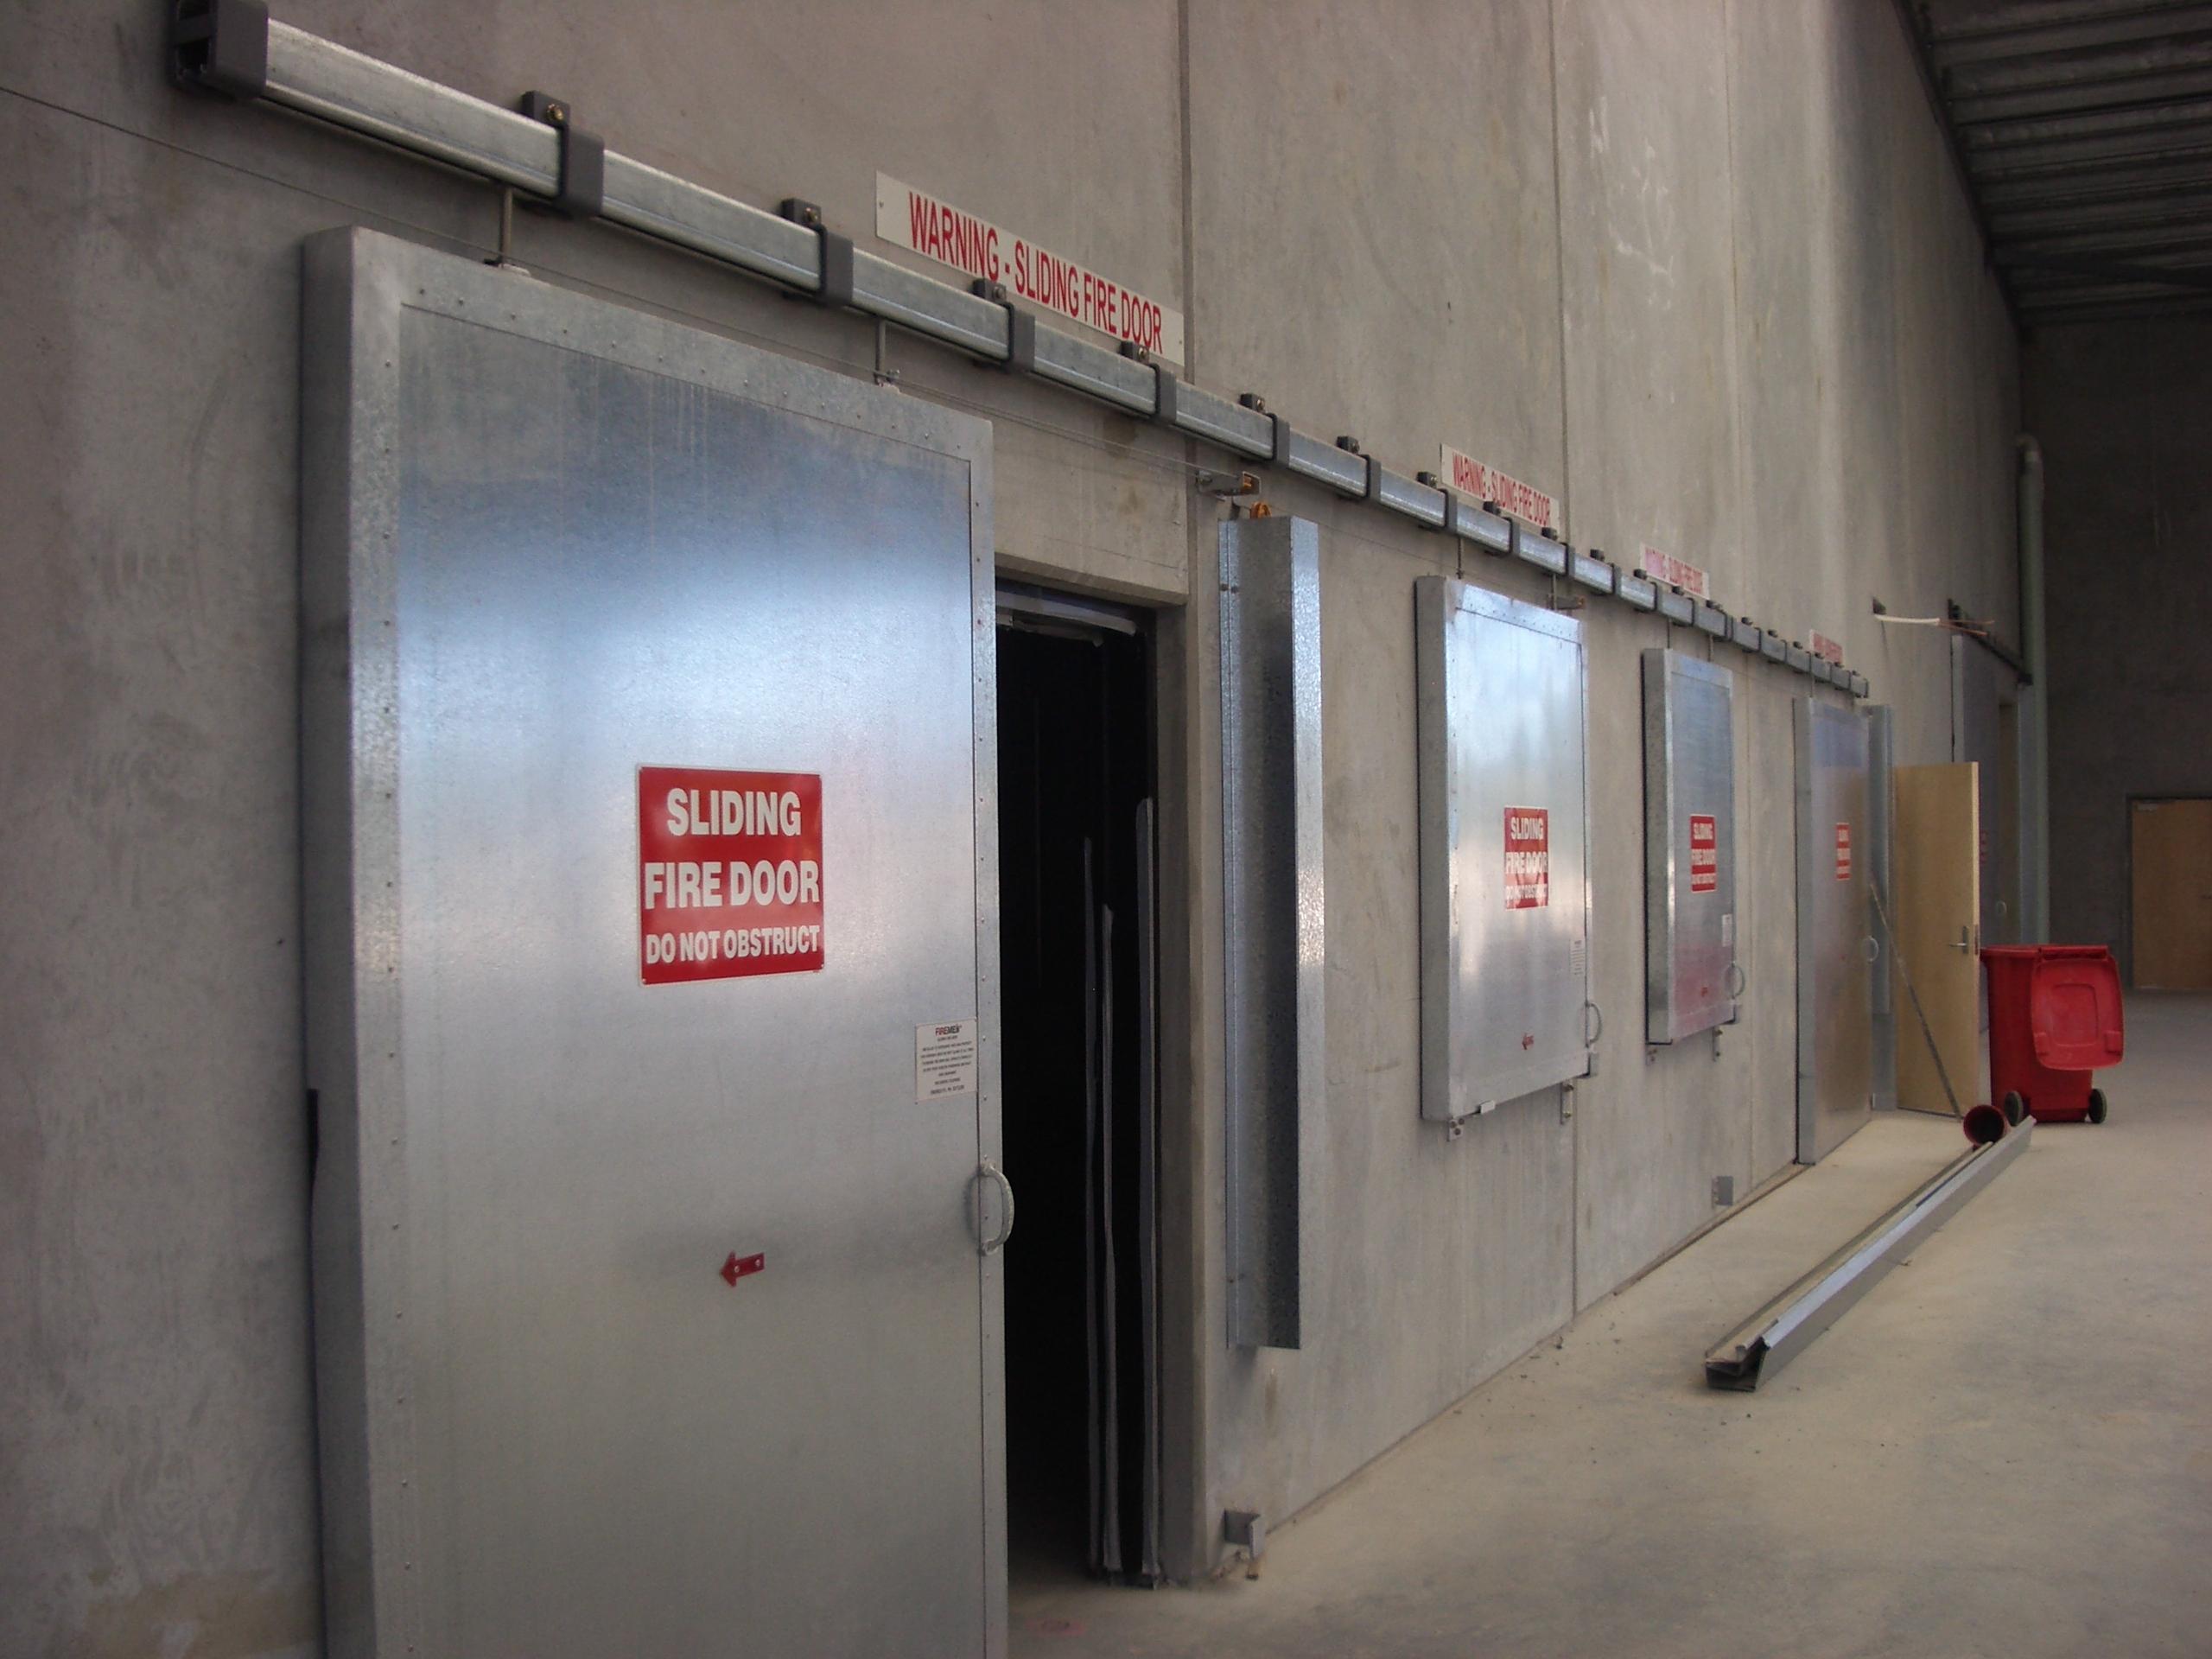 Fireproof Sliding Doorsfiremex sliding fire rated fire doors